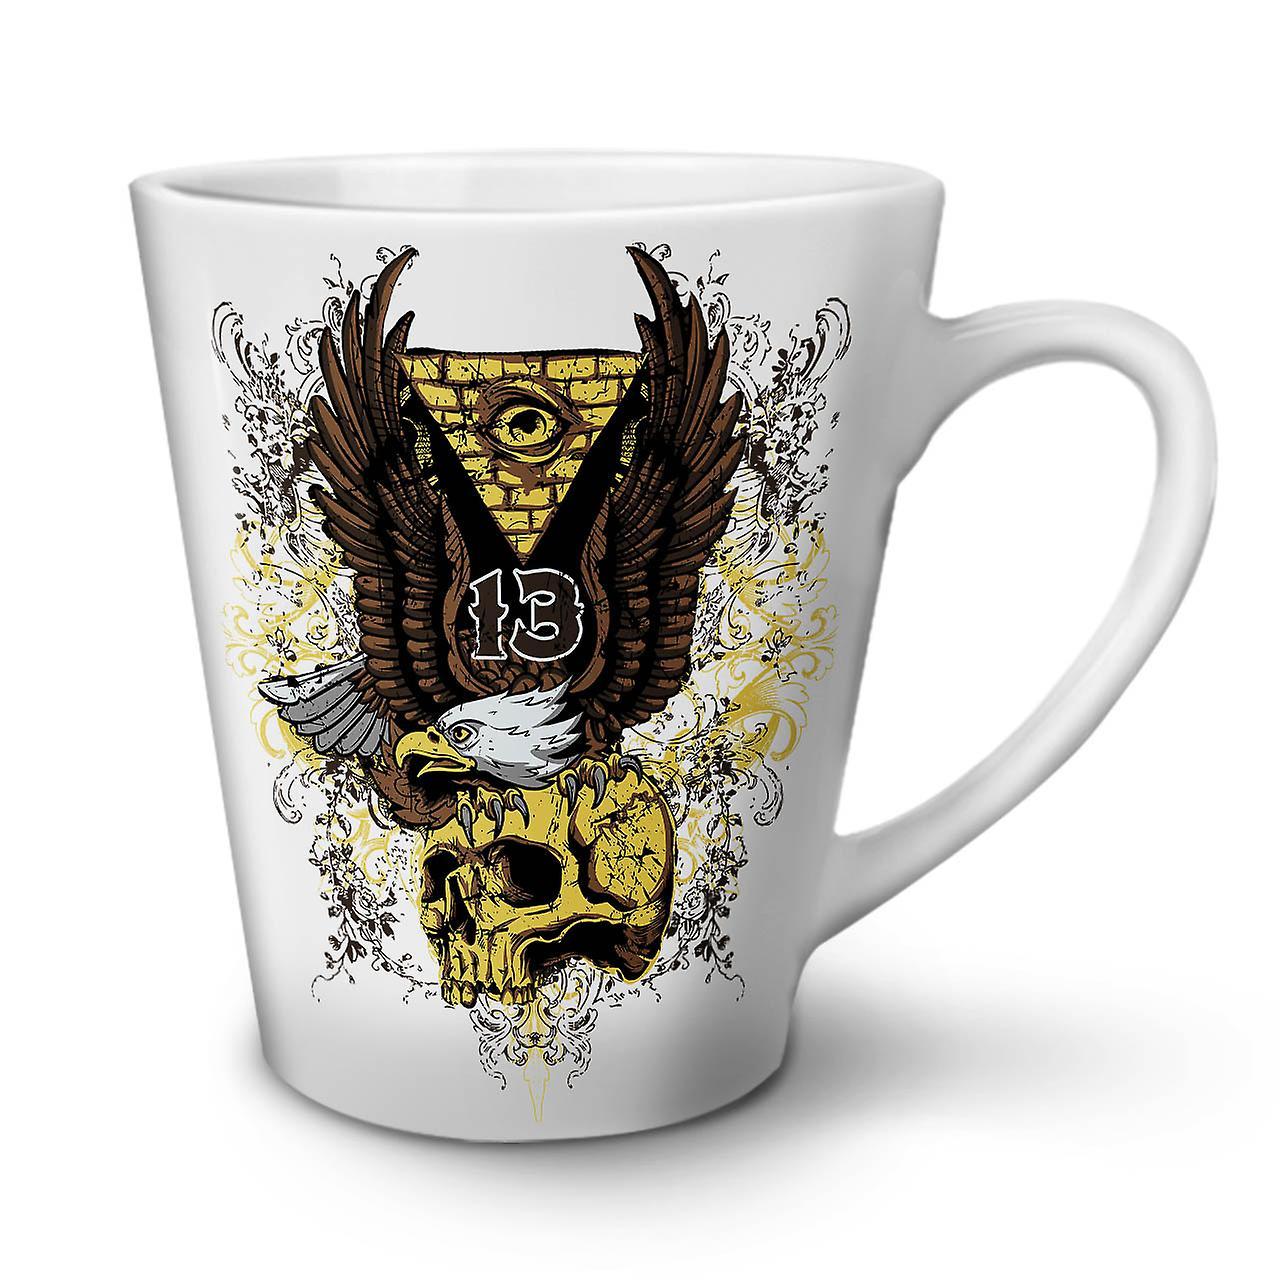 Mug Triangle Latte OzWellcoda Coffee Eagle White 12 Tea Skull New Ceramic rthQdCxs